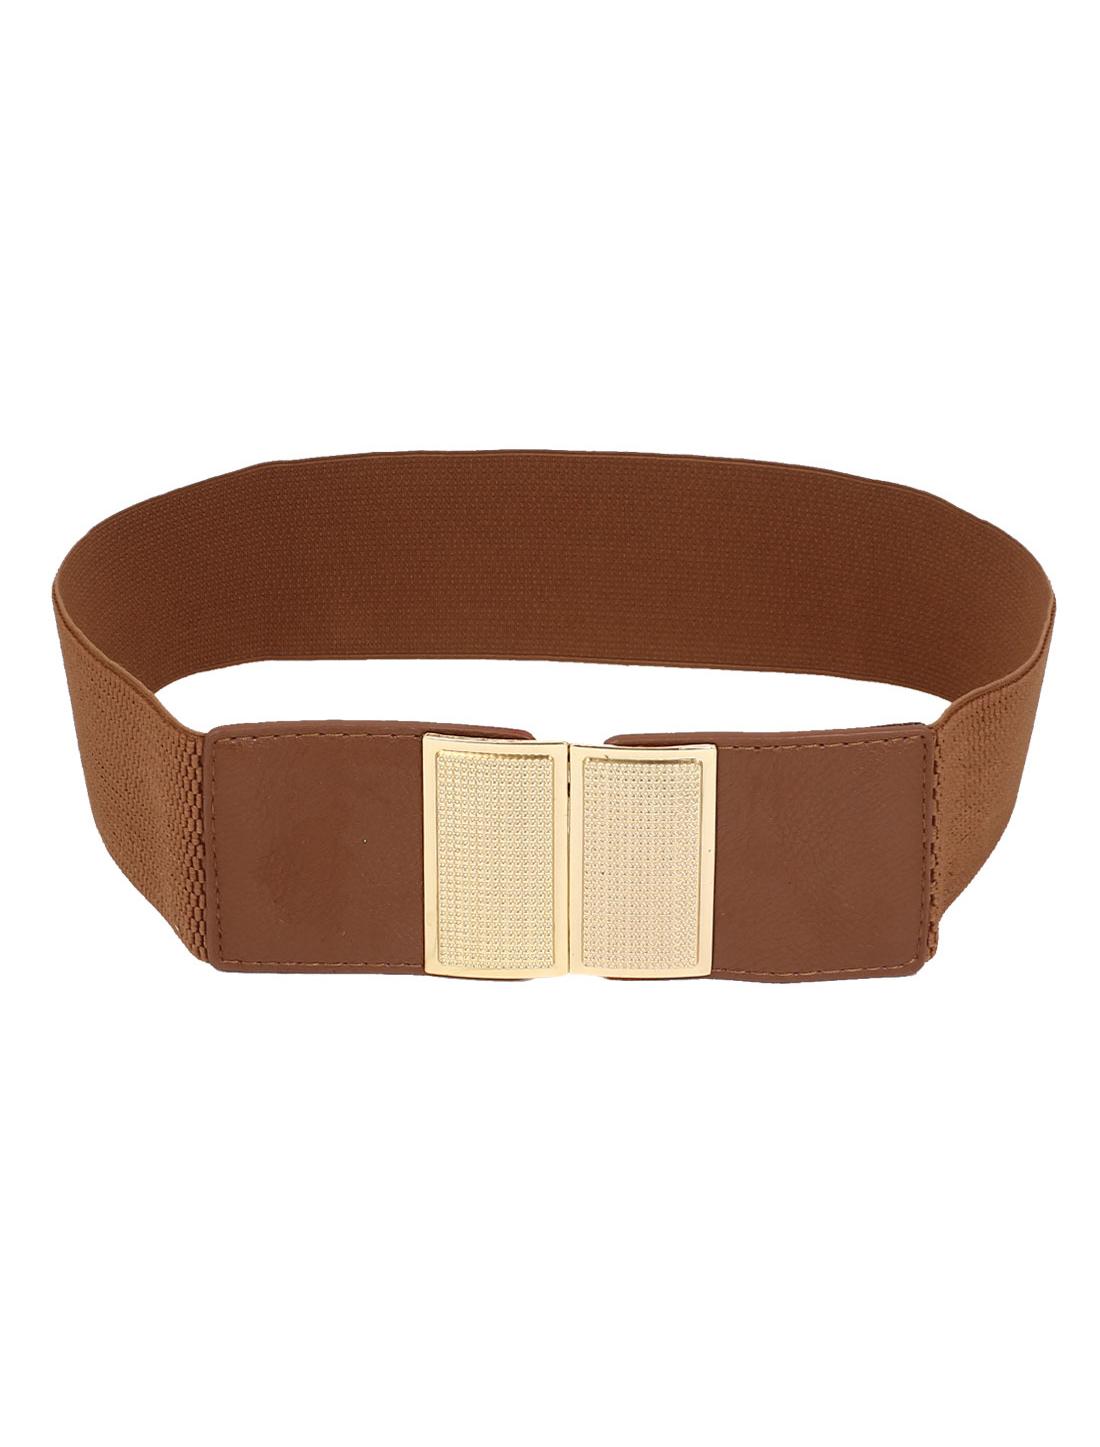 Lady Metal Rectangle Shape Interlock Buckle Faux Leather Stretch Cinch Waist Belt Band Brown